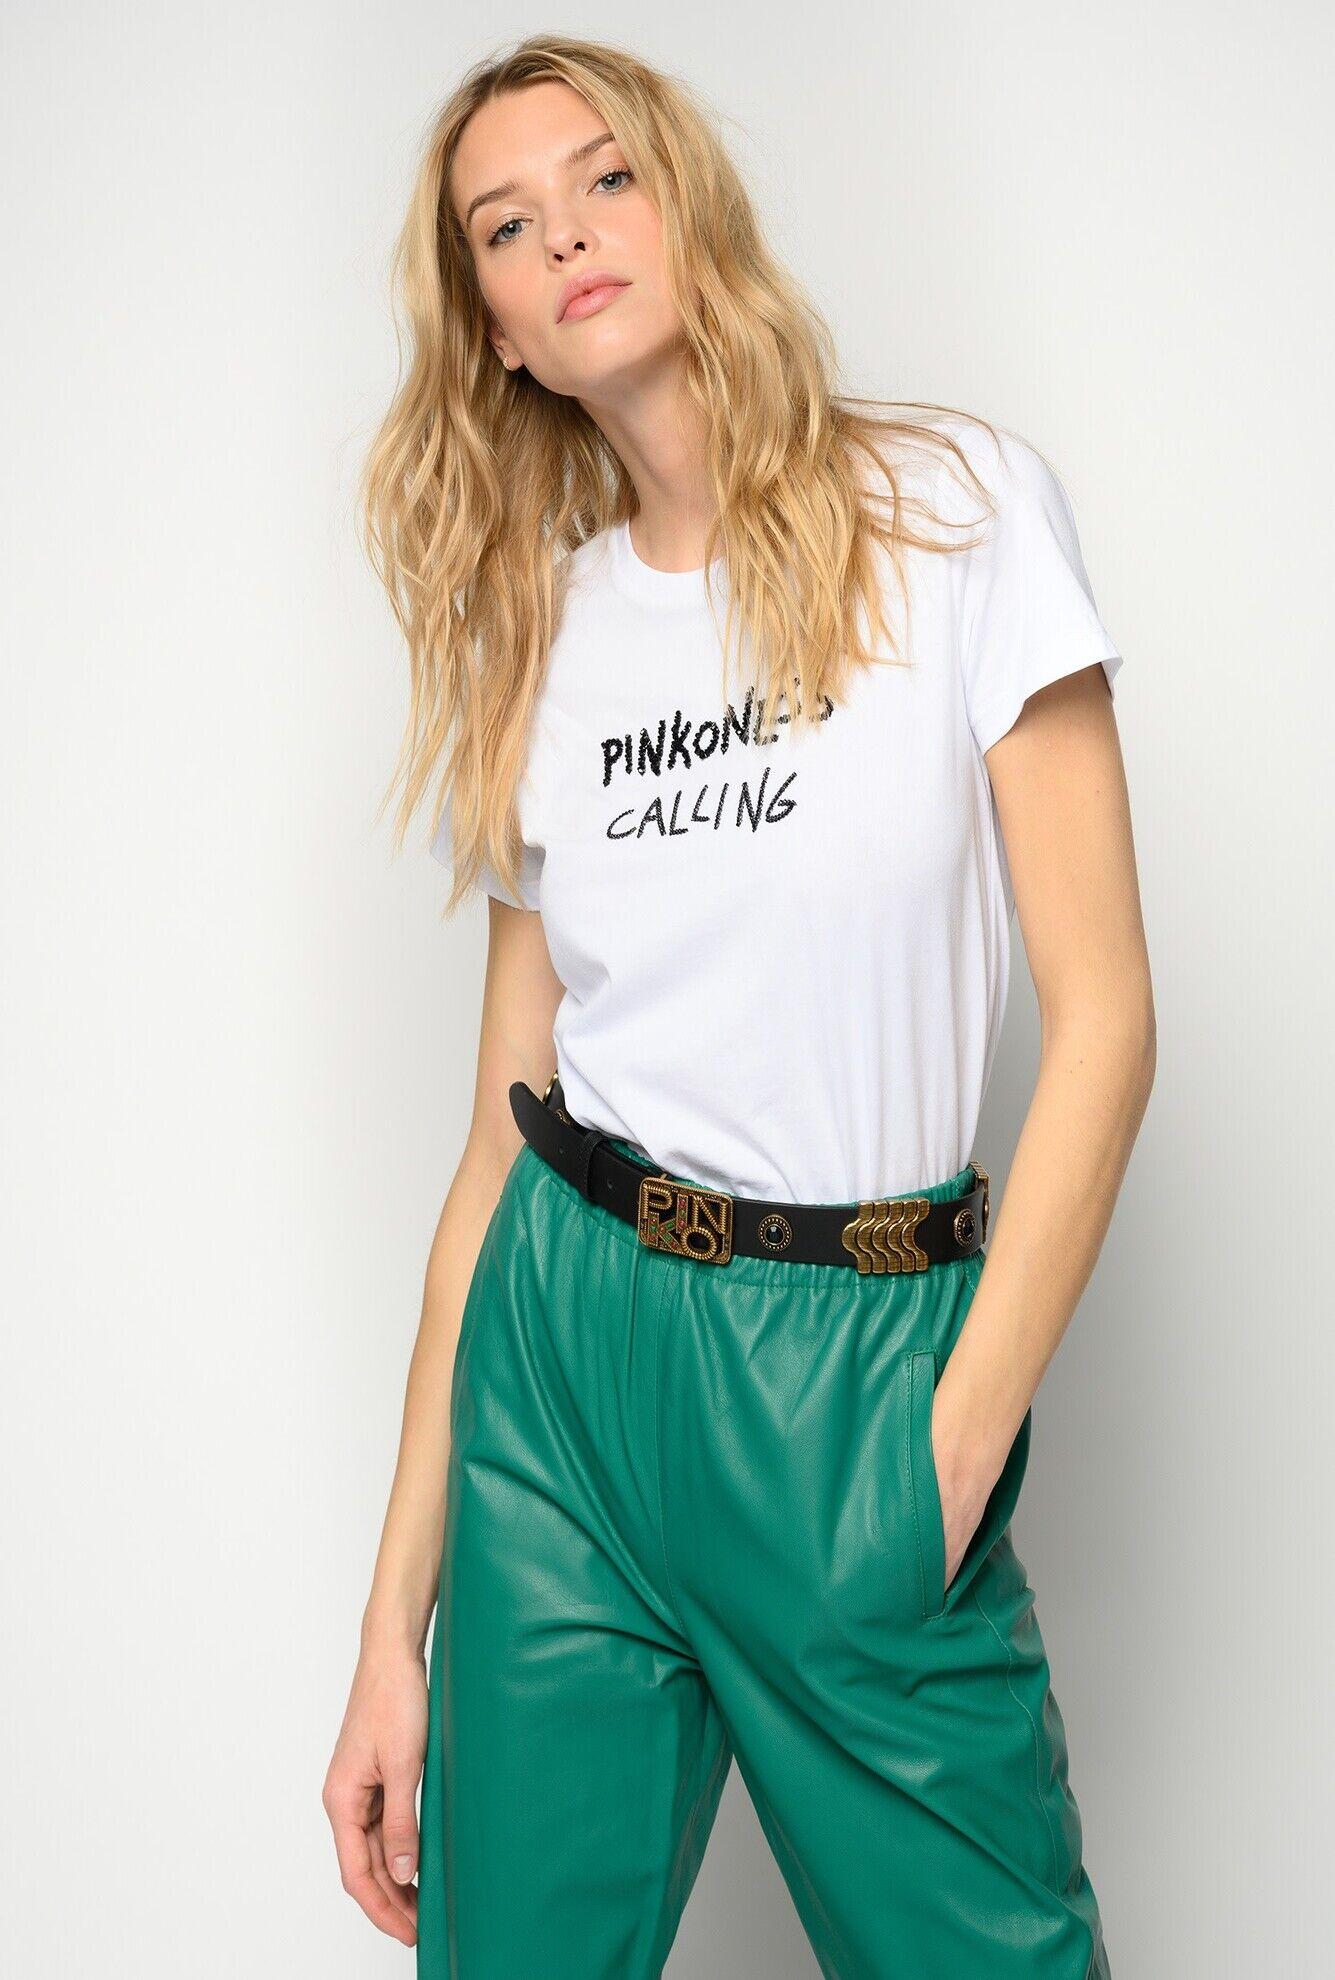 Pinkoness Calling Embroidered T-Shirt - Pinko